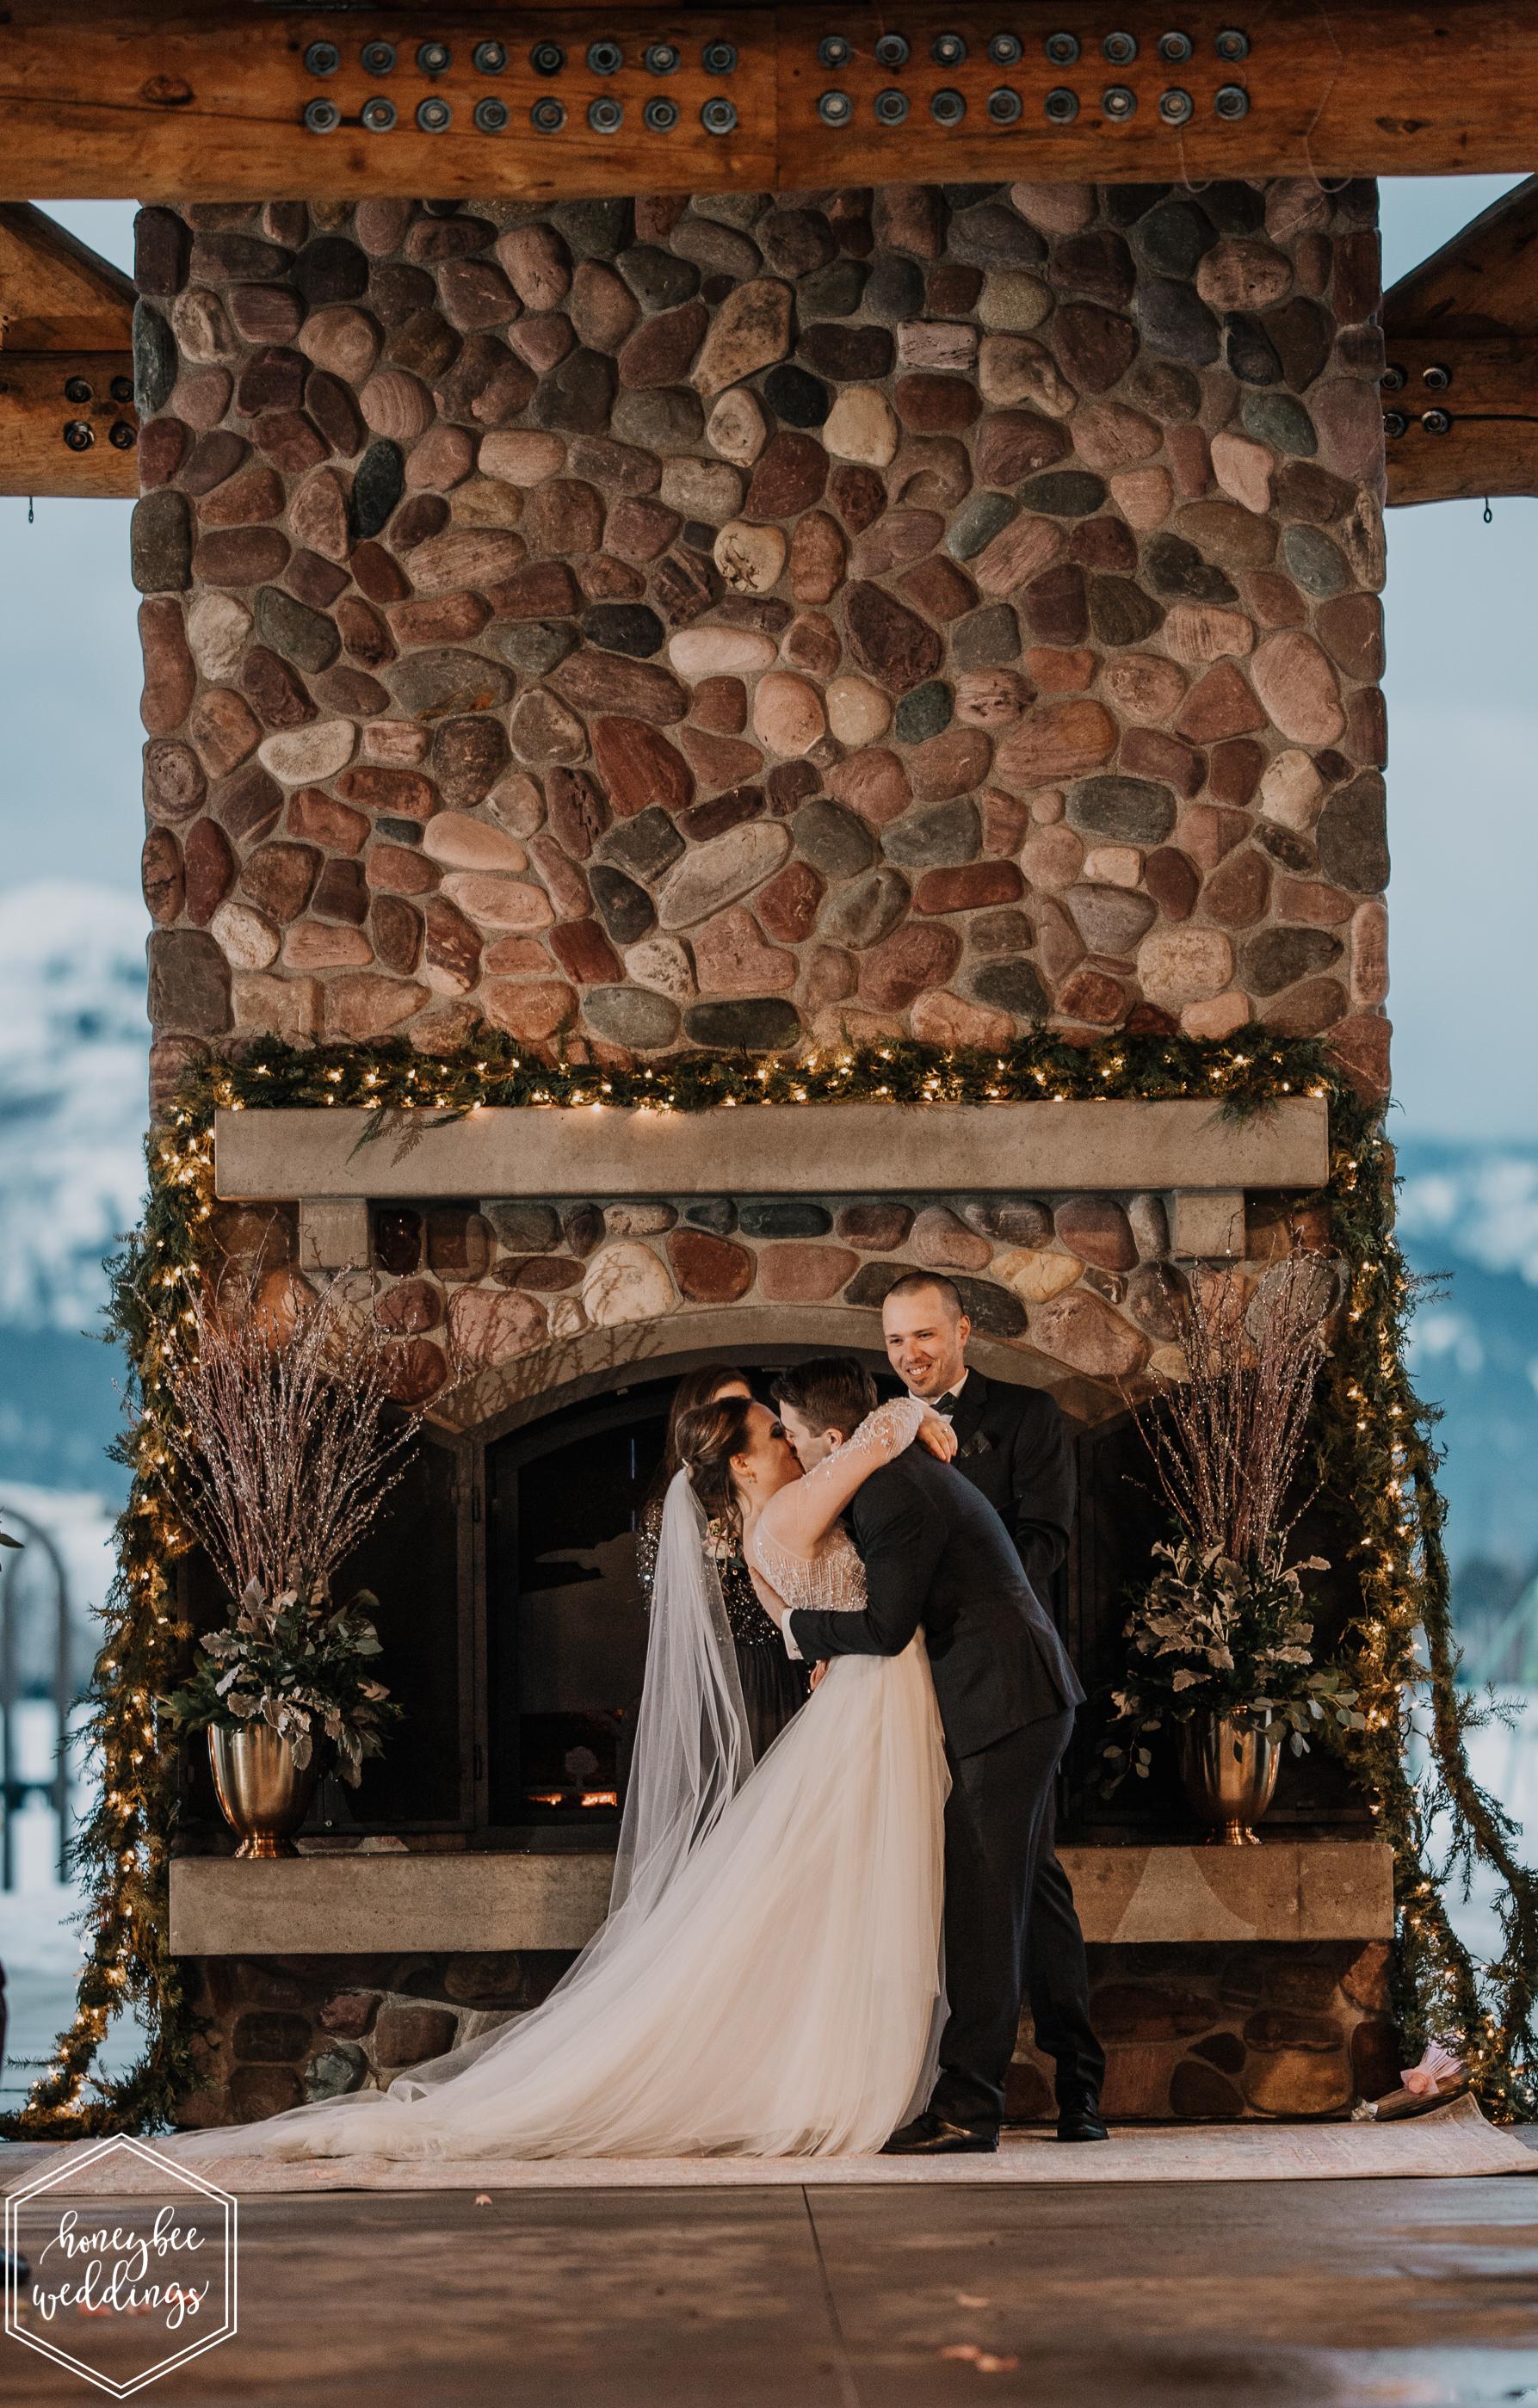 0258Montana Wedding Photographer_Montana winter wedding_Wedding at Fort Missoula_Meri & Carter_December 31, 2015-440.jpg